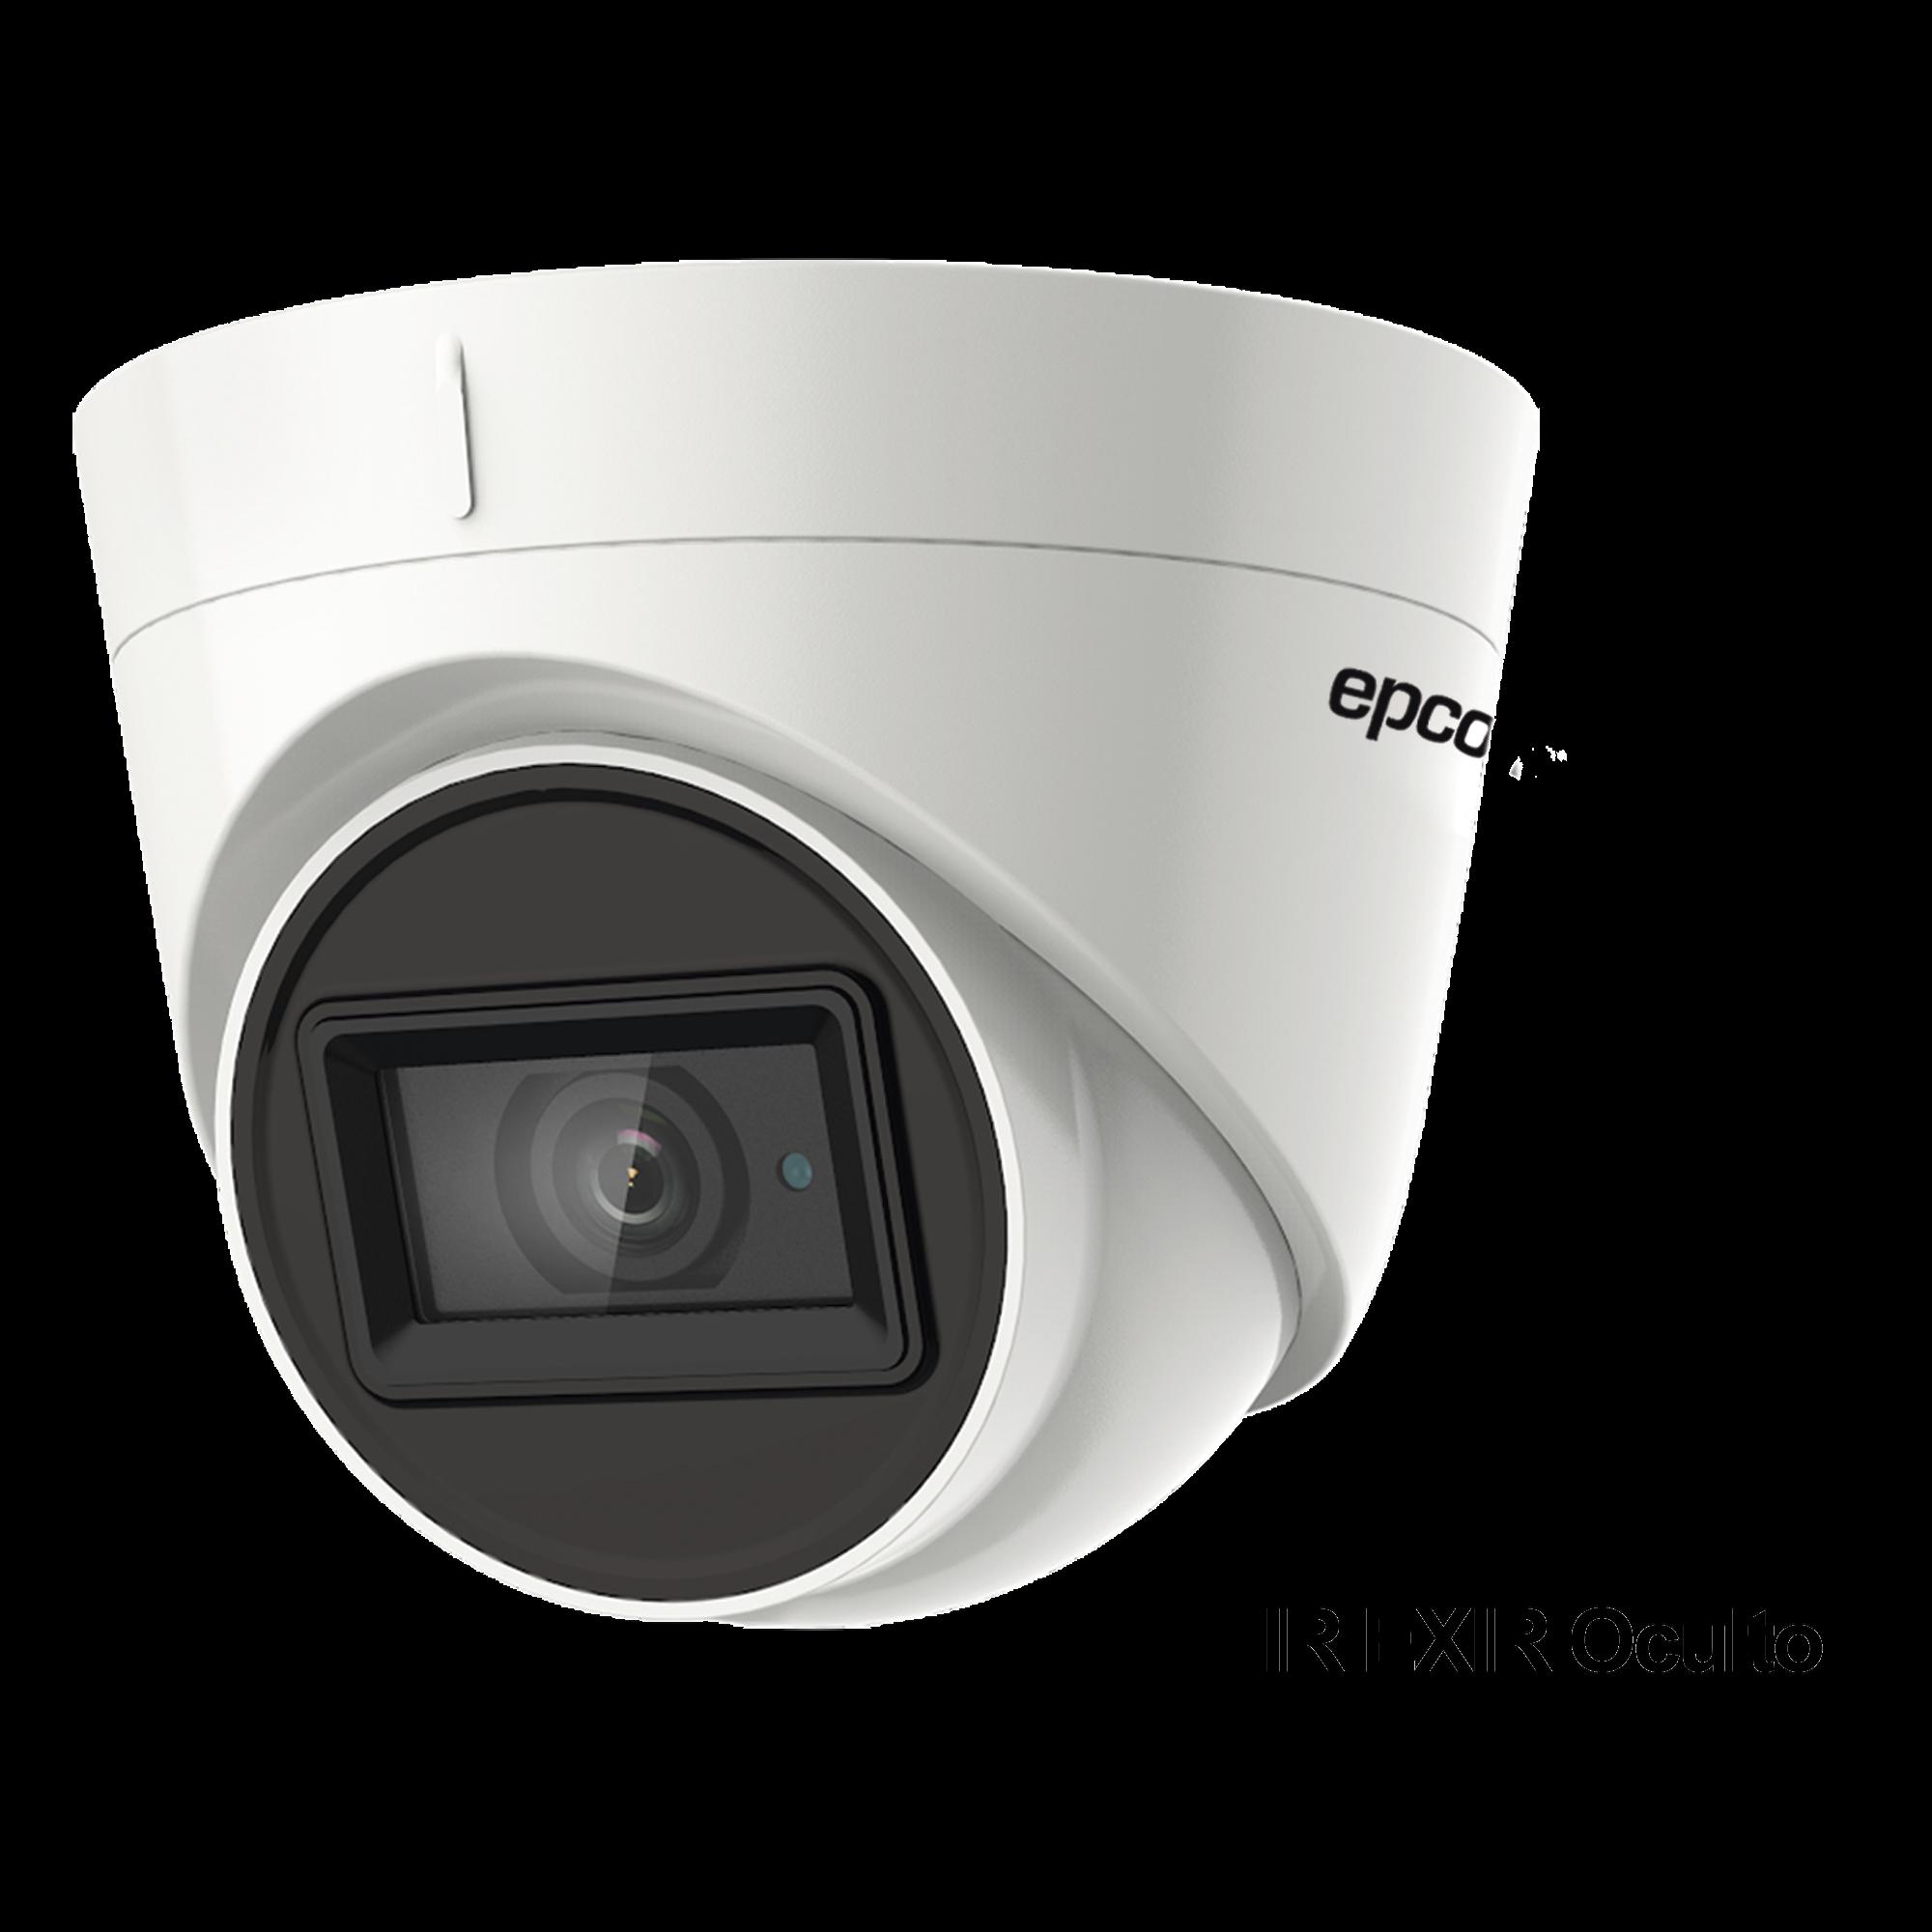 Eyeball 4K (8 Megapixeles) TURBOHD / Gran Angular / Lente 2.8 mm / Potente IR EXIR 60 mts / Exterior IP67.